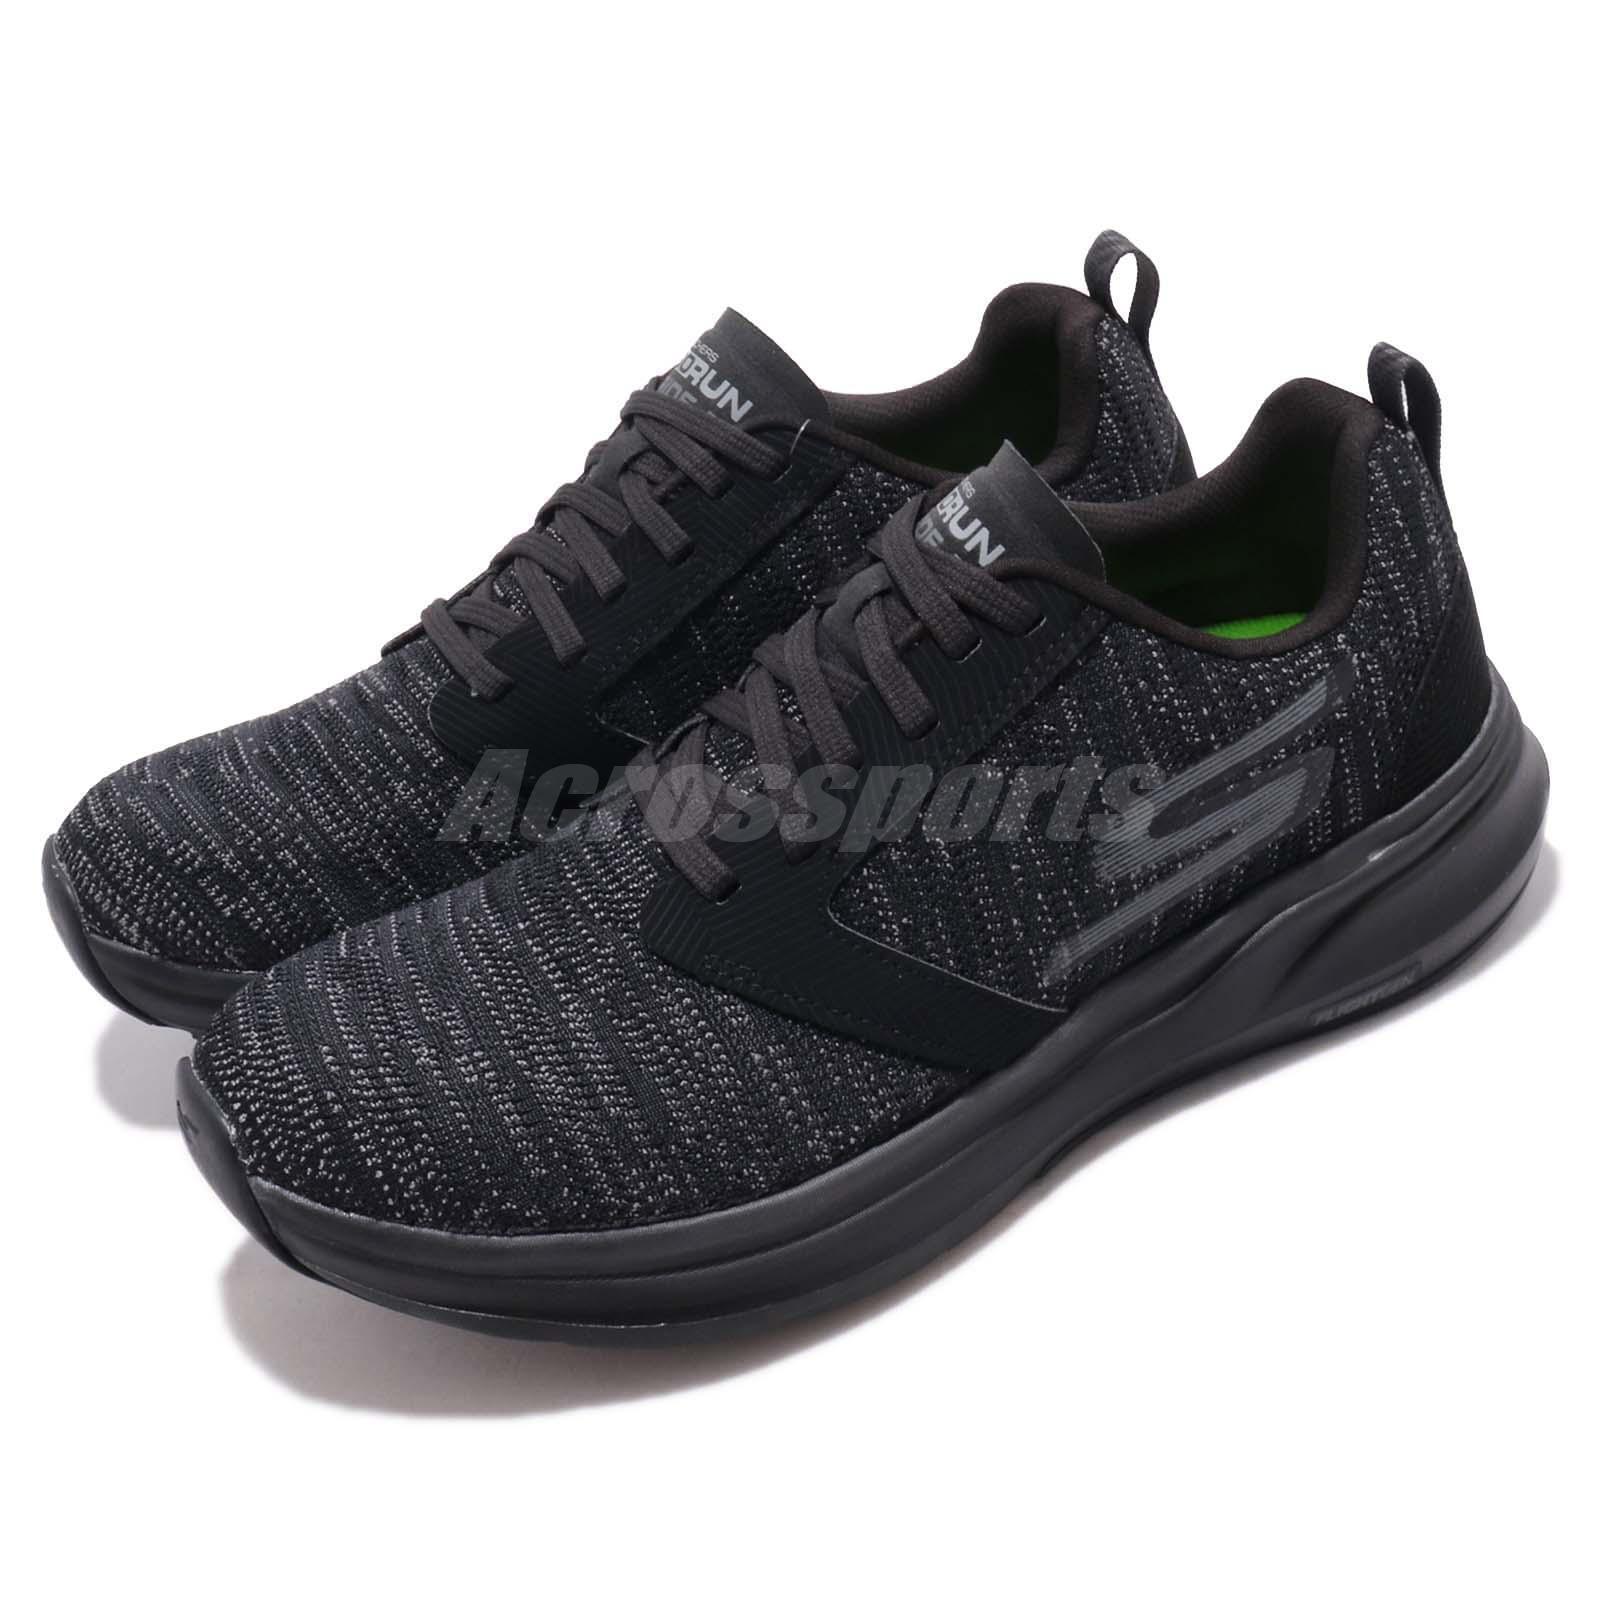 Skechers Ride 7 Negro Gris Hombre Running Walking Sneakers Casual Zapatos Sneakers Walking 55200-BBK 17d6db